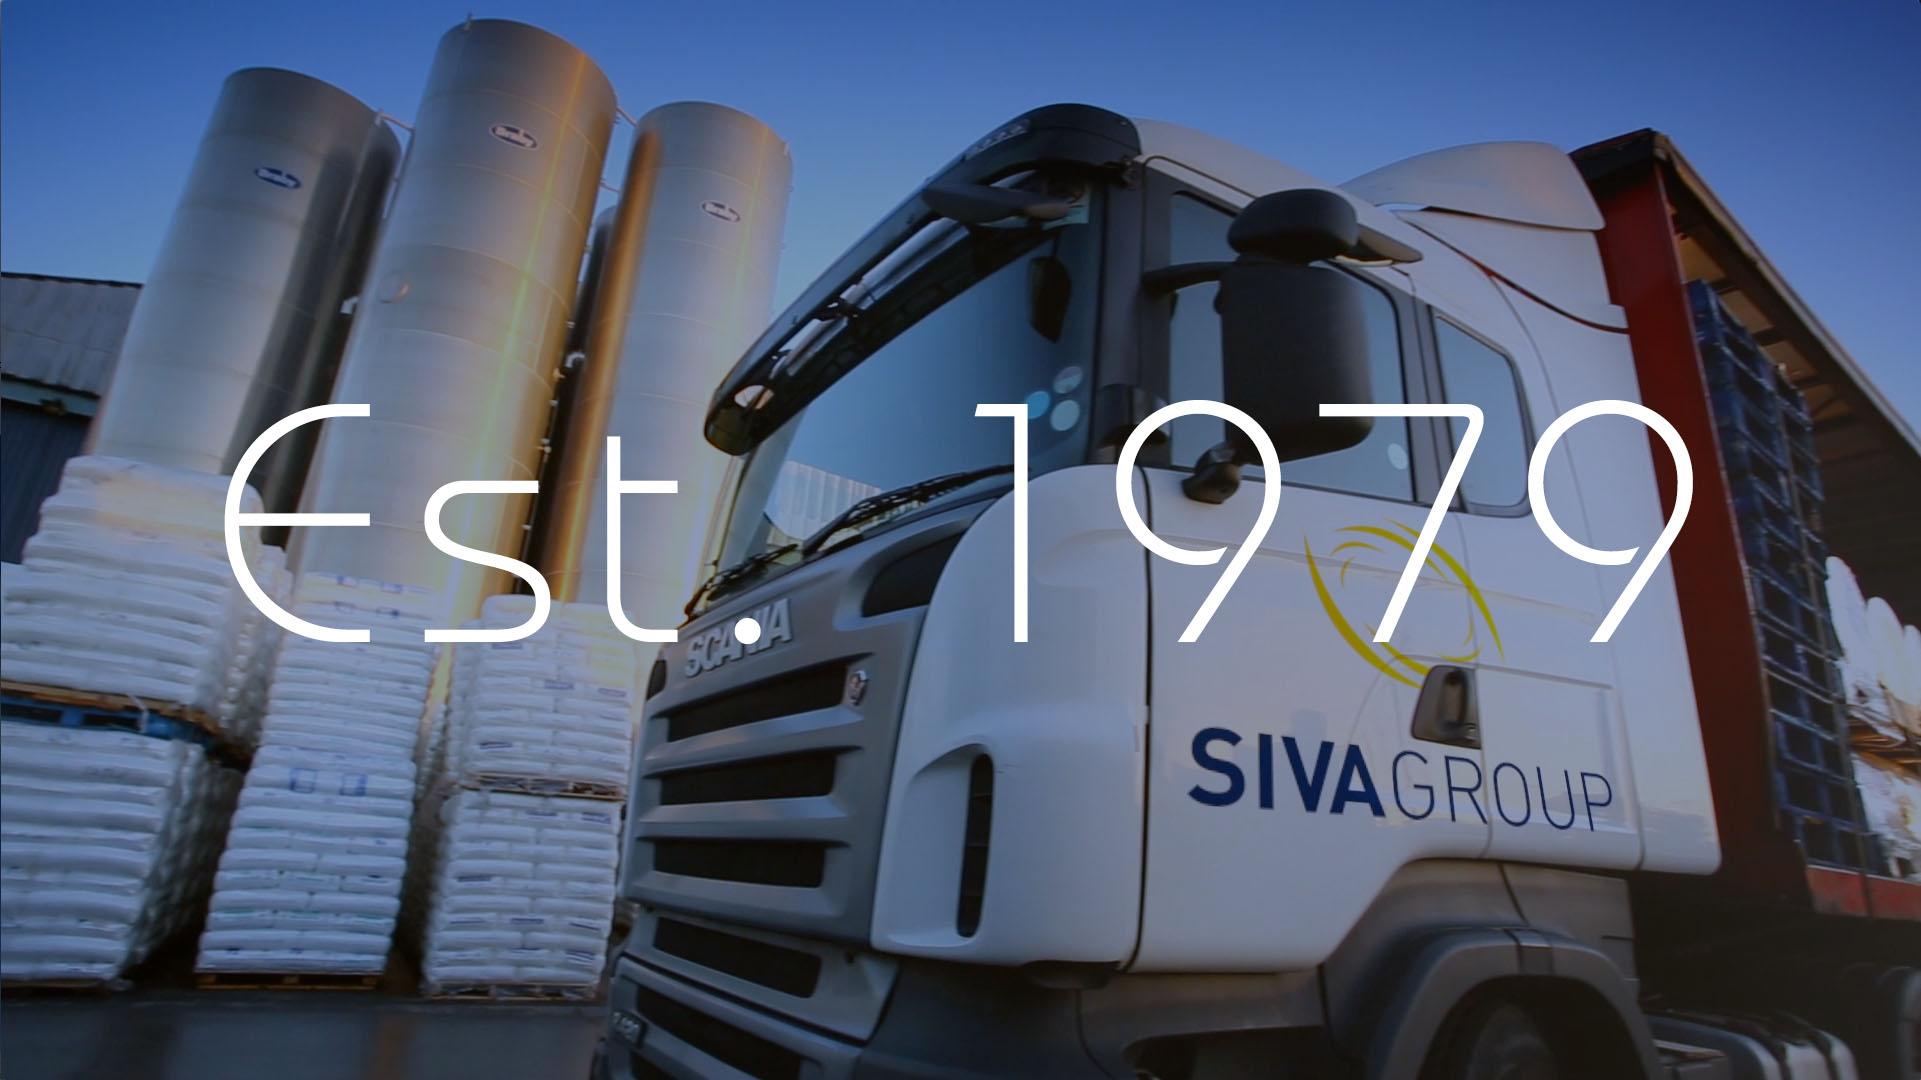 sivagroup-established-1979.jpg